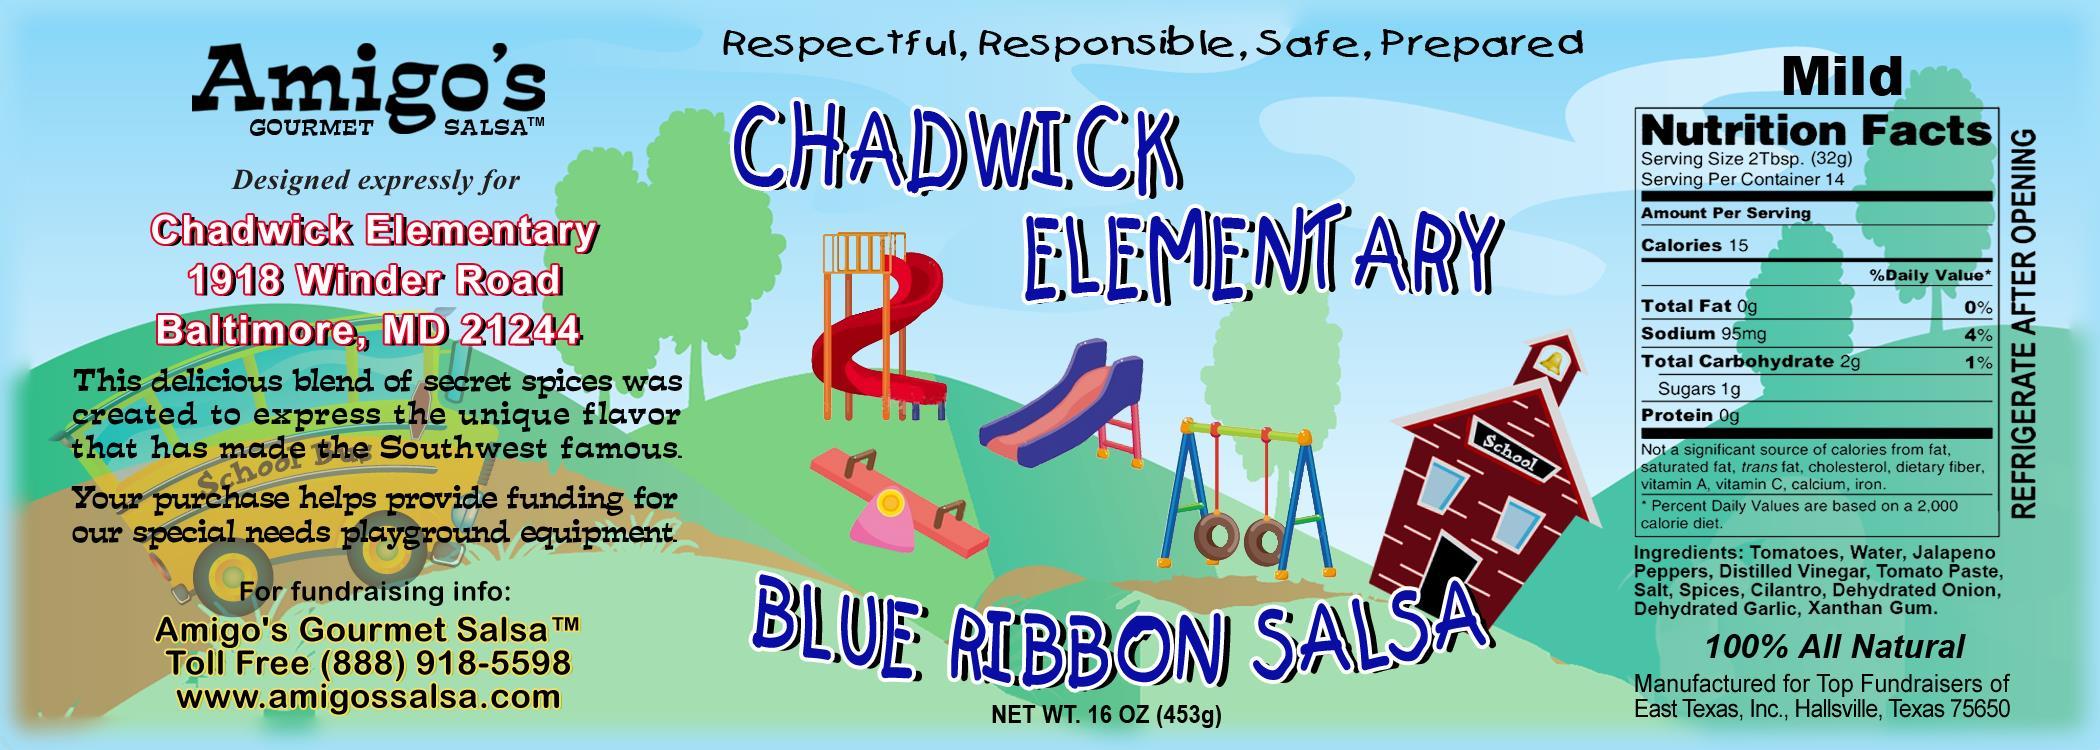 Chadwick Elementary Jar Mild.jpg